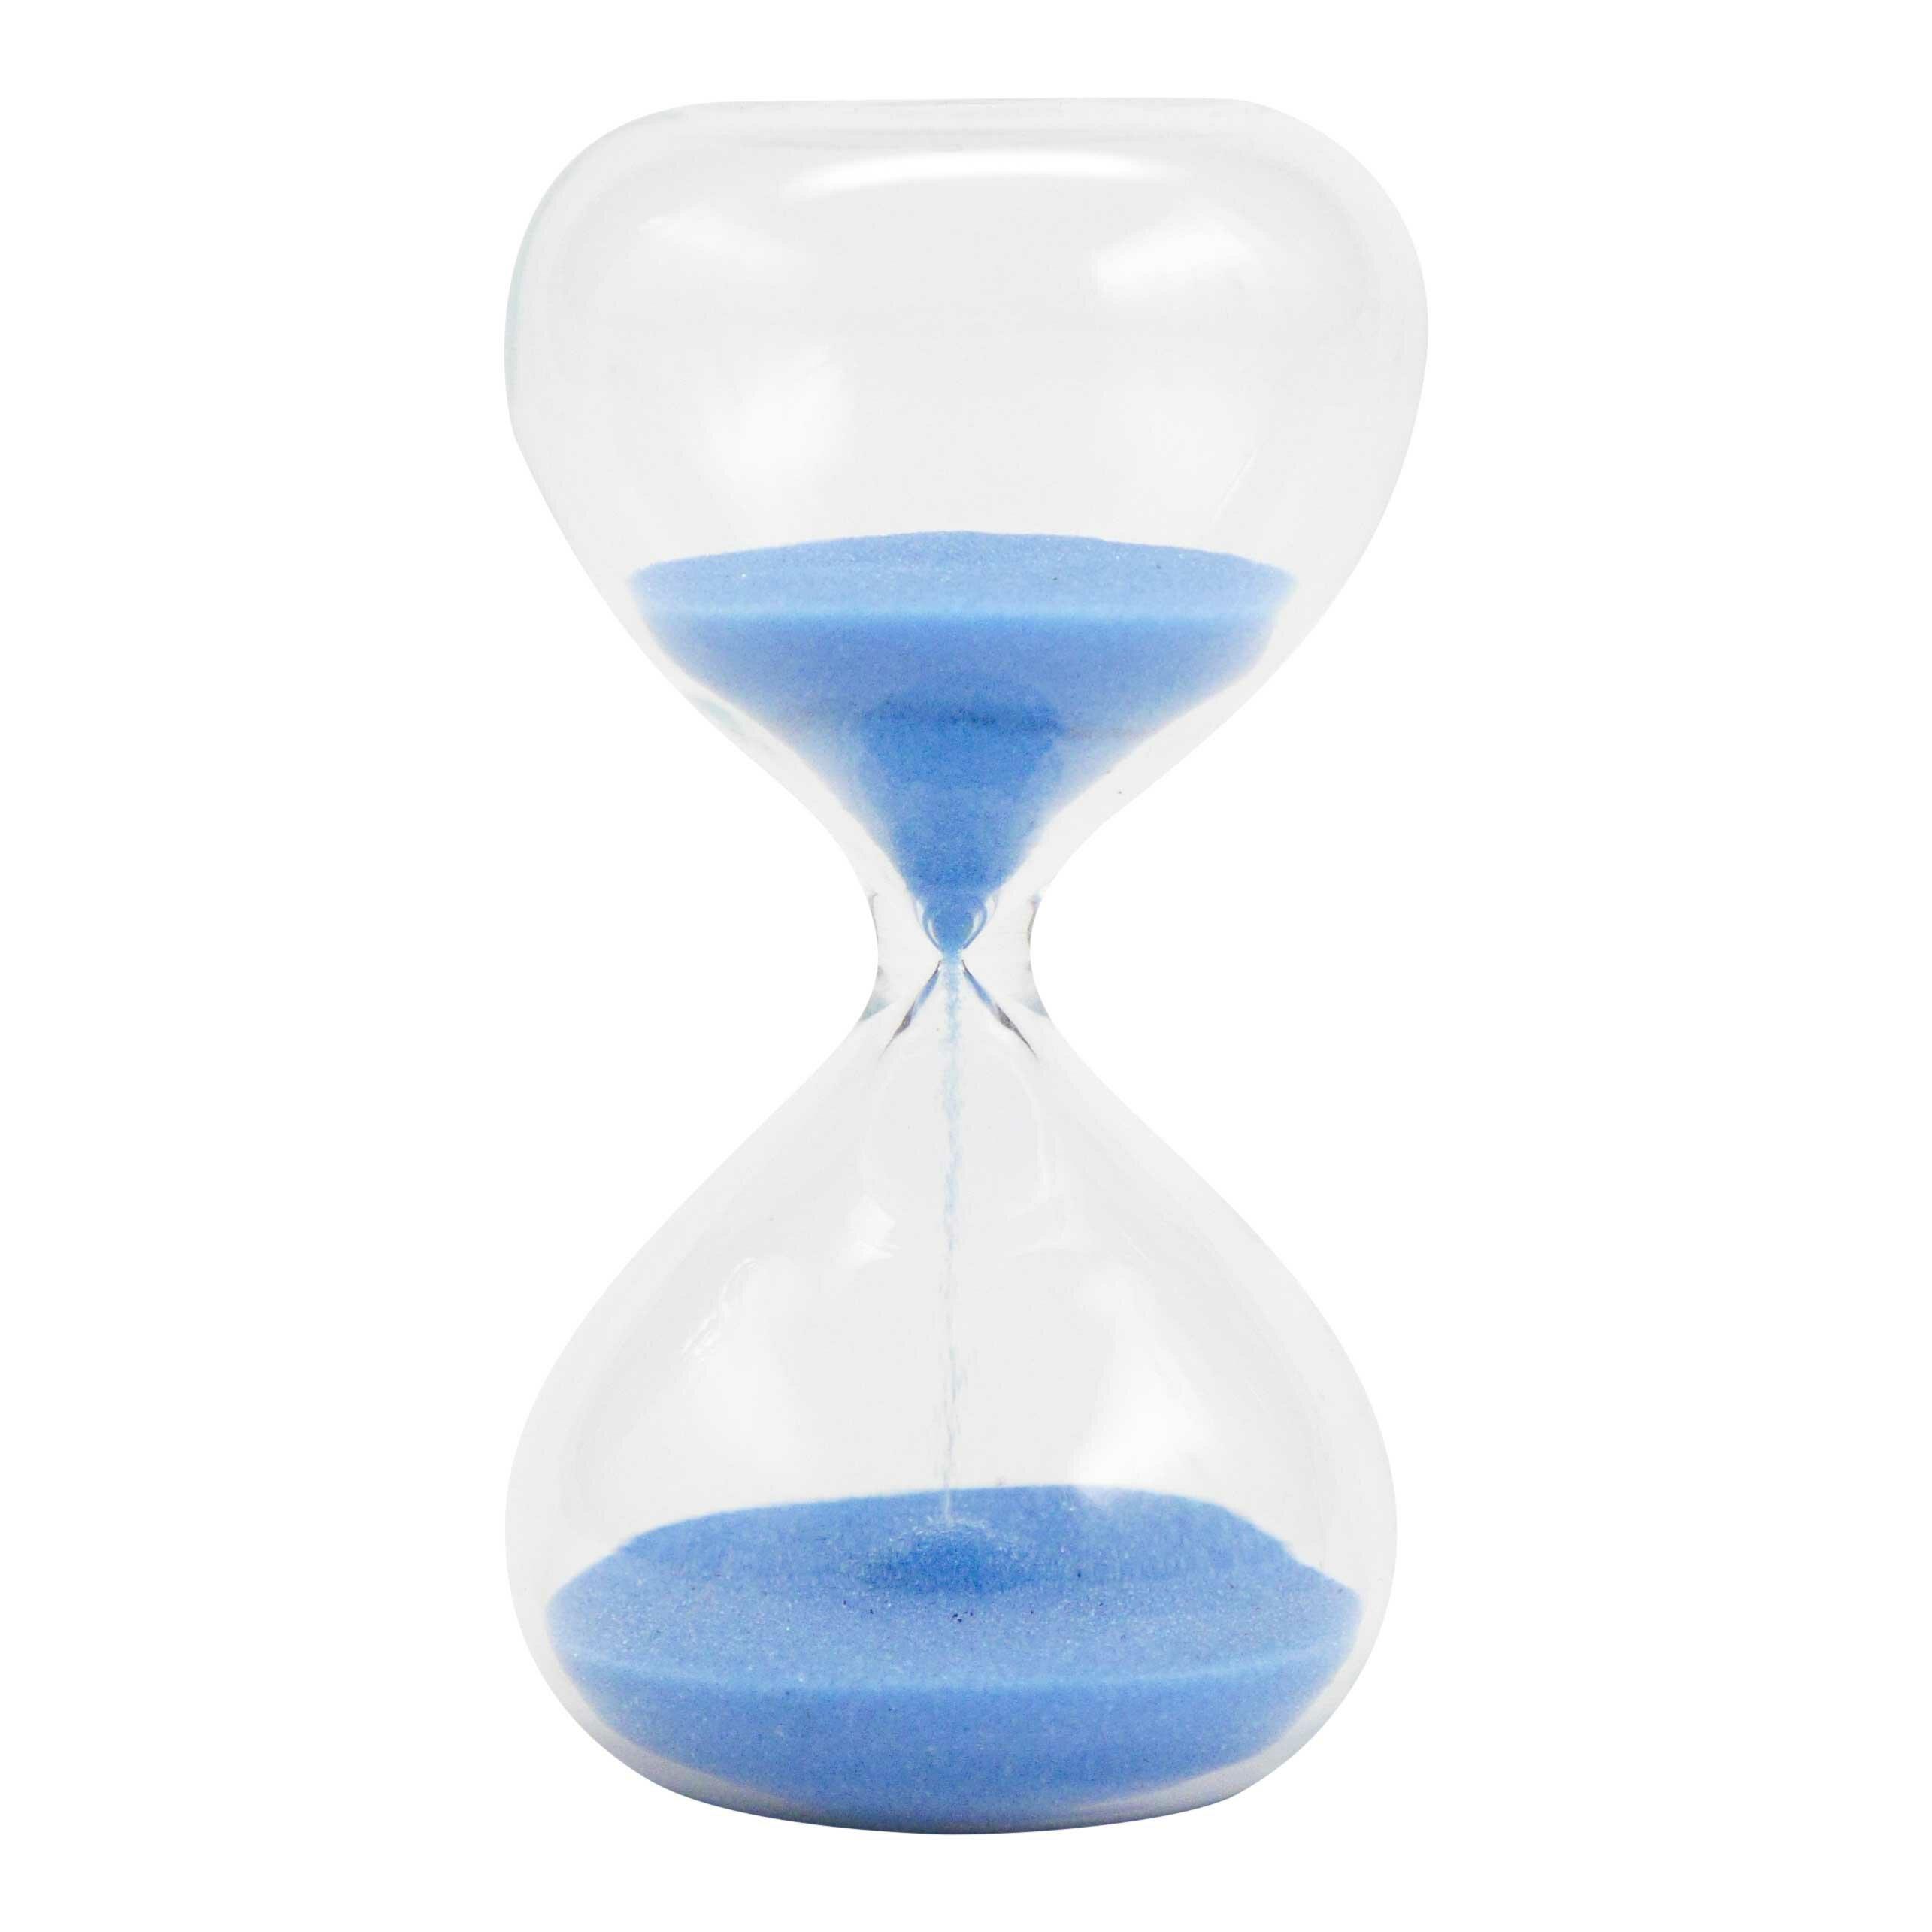 plum and punch hanlon 10 minute sand timer hourglass wayfair